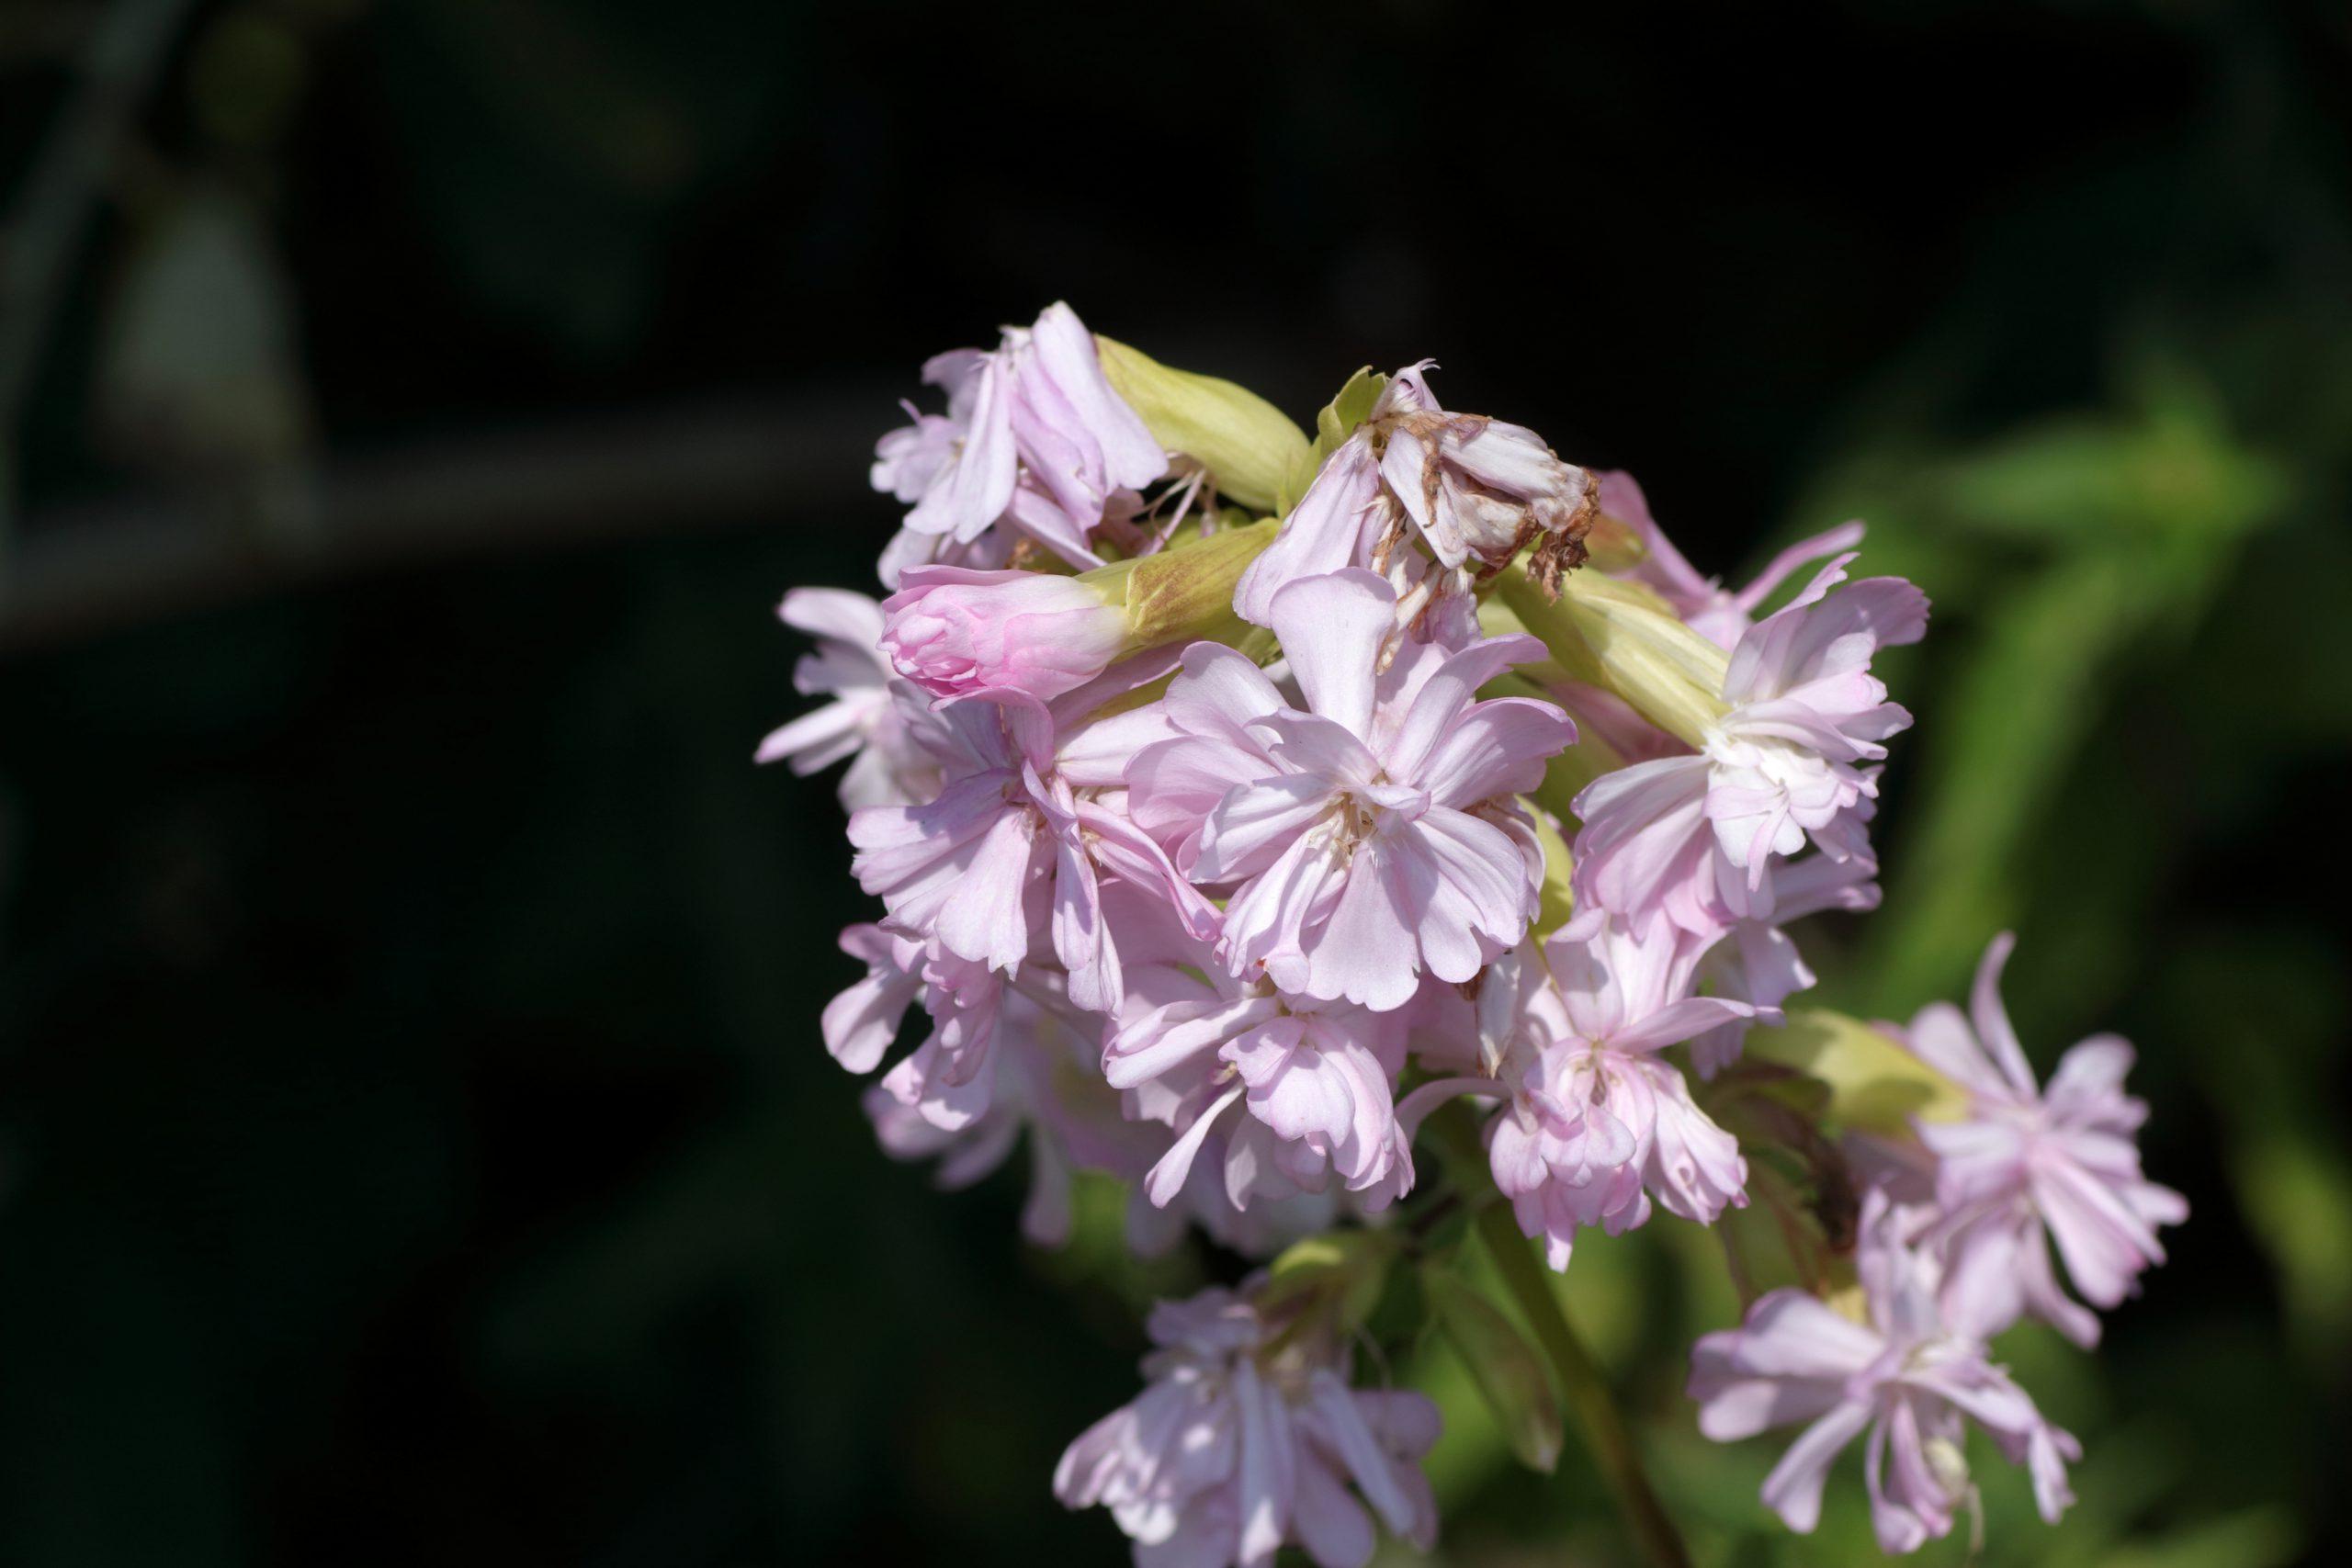 Echtes Seifenkraut - Blüte